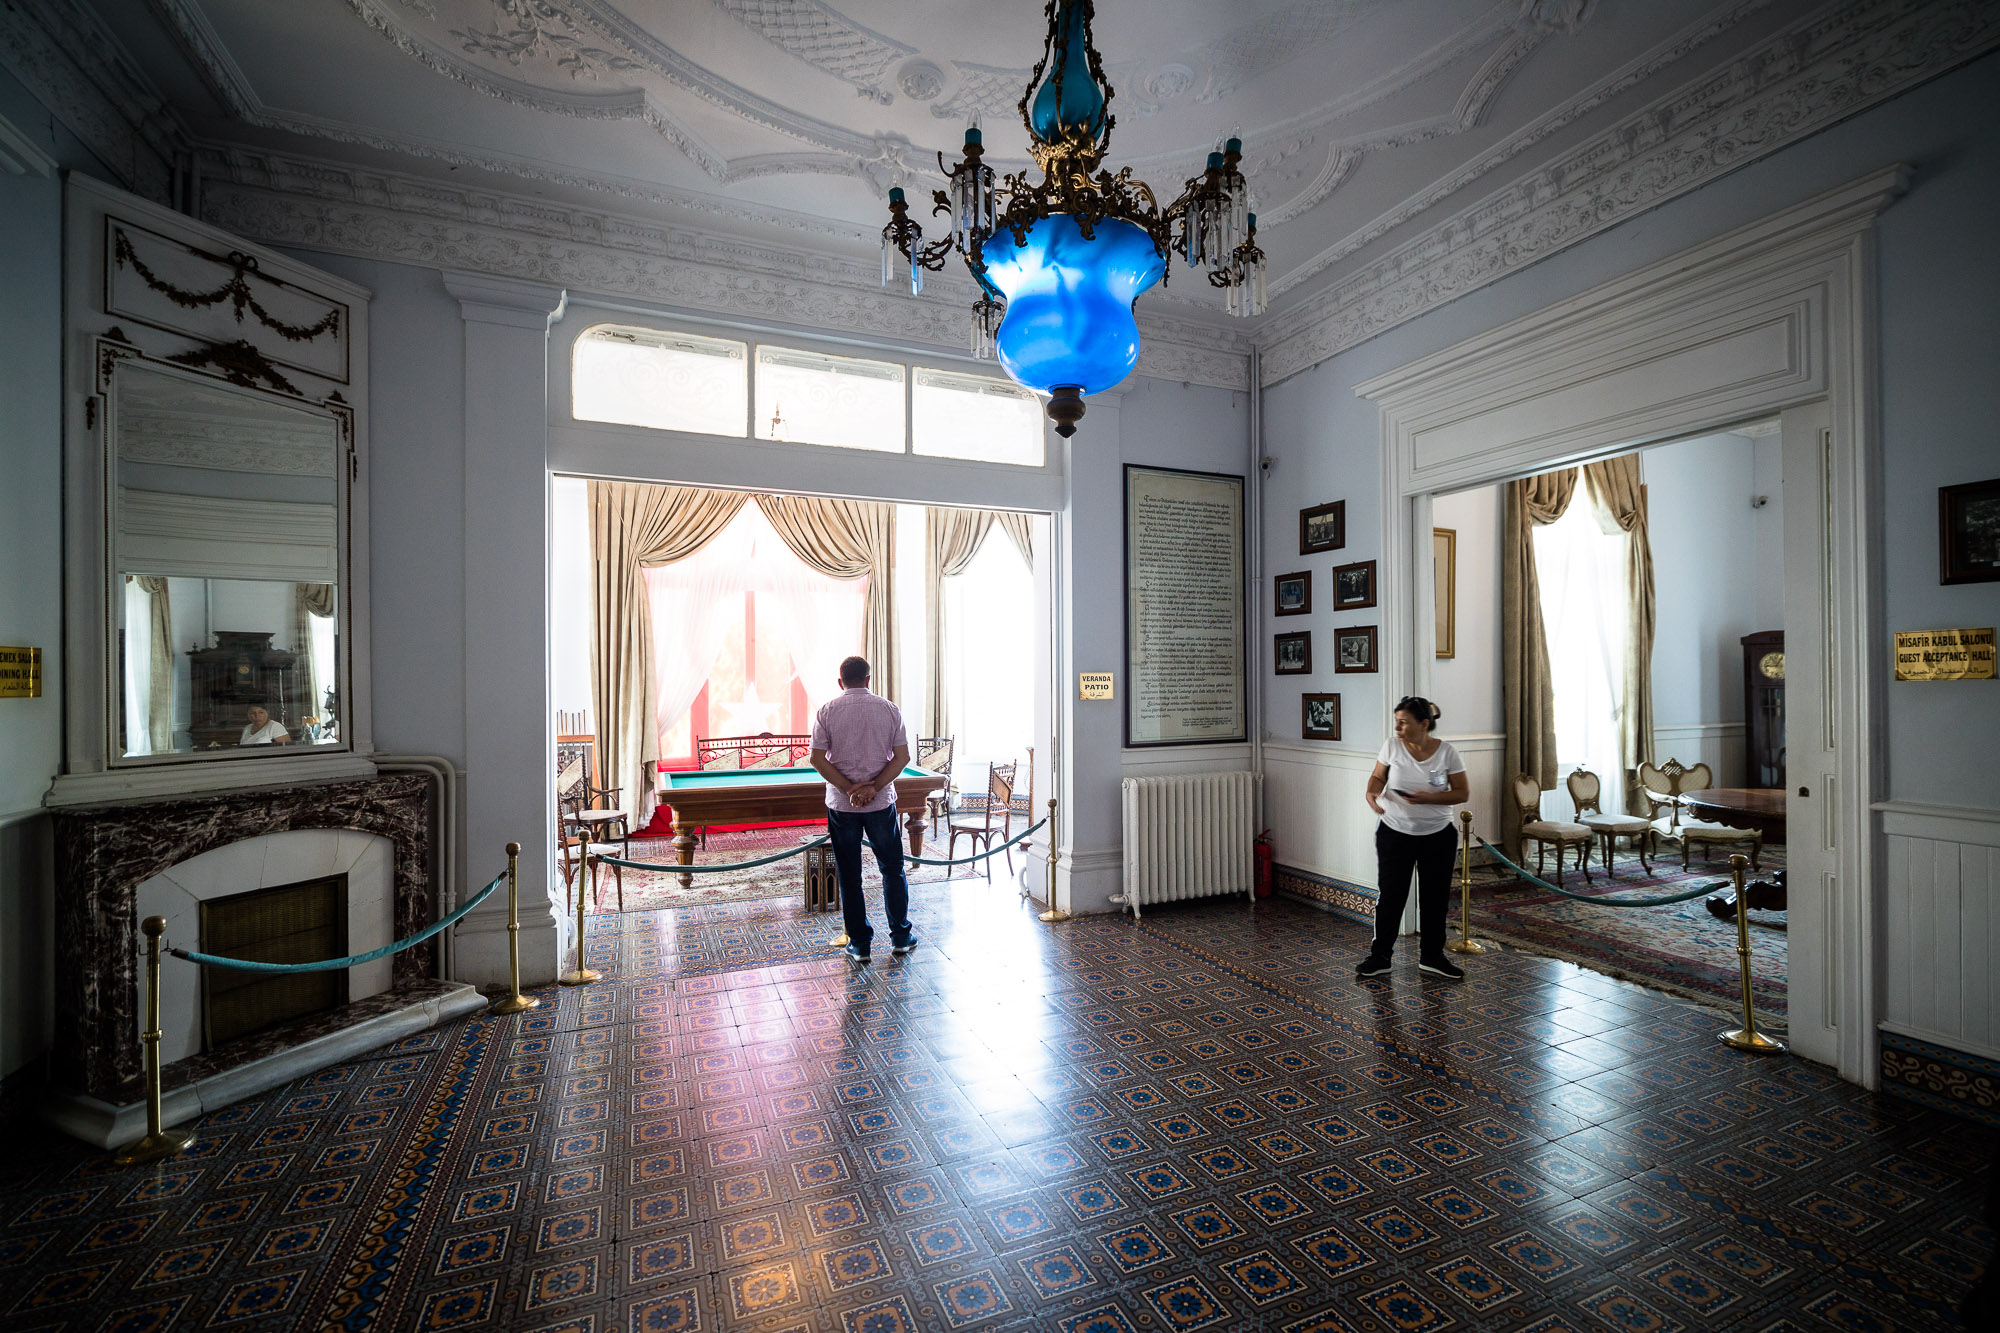 Atatürk's lobby